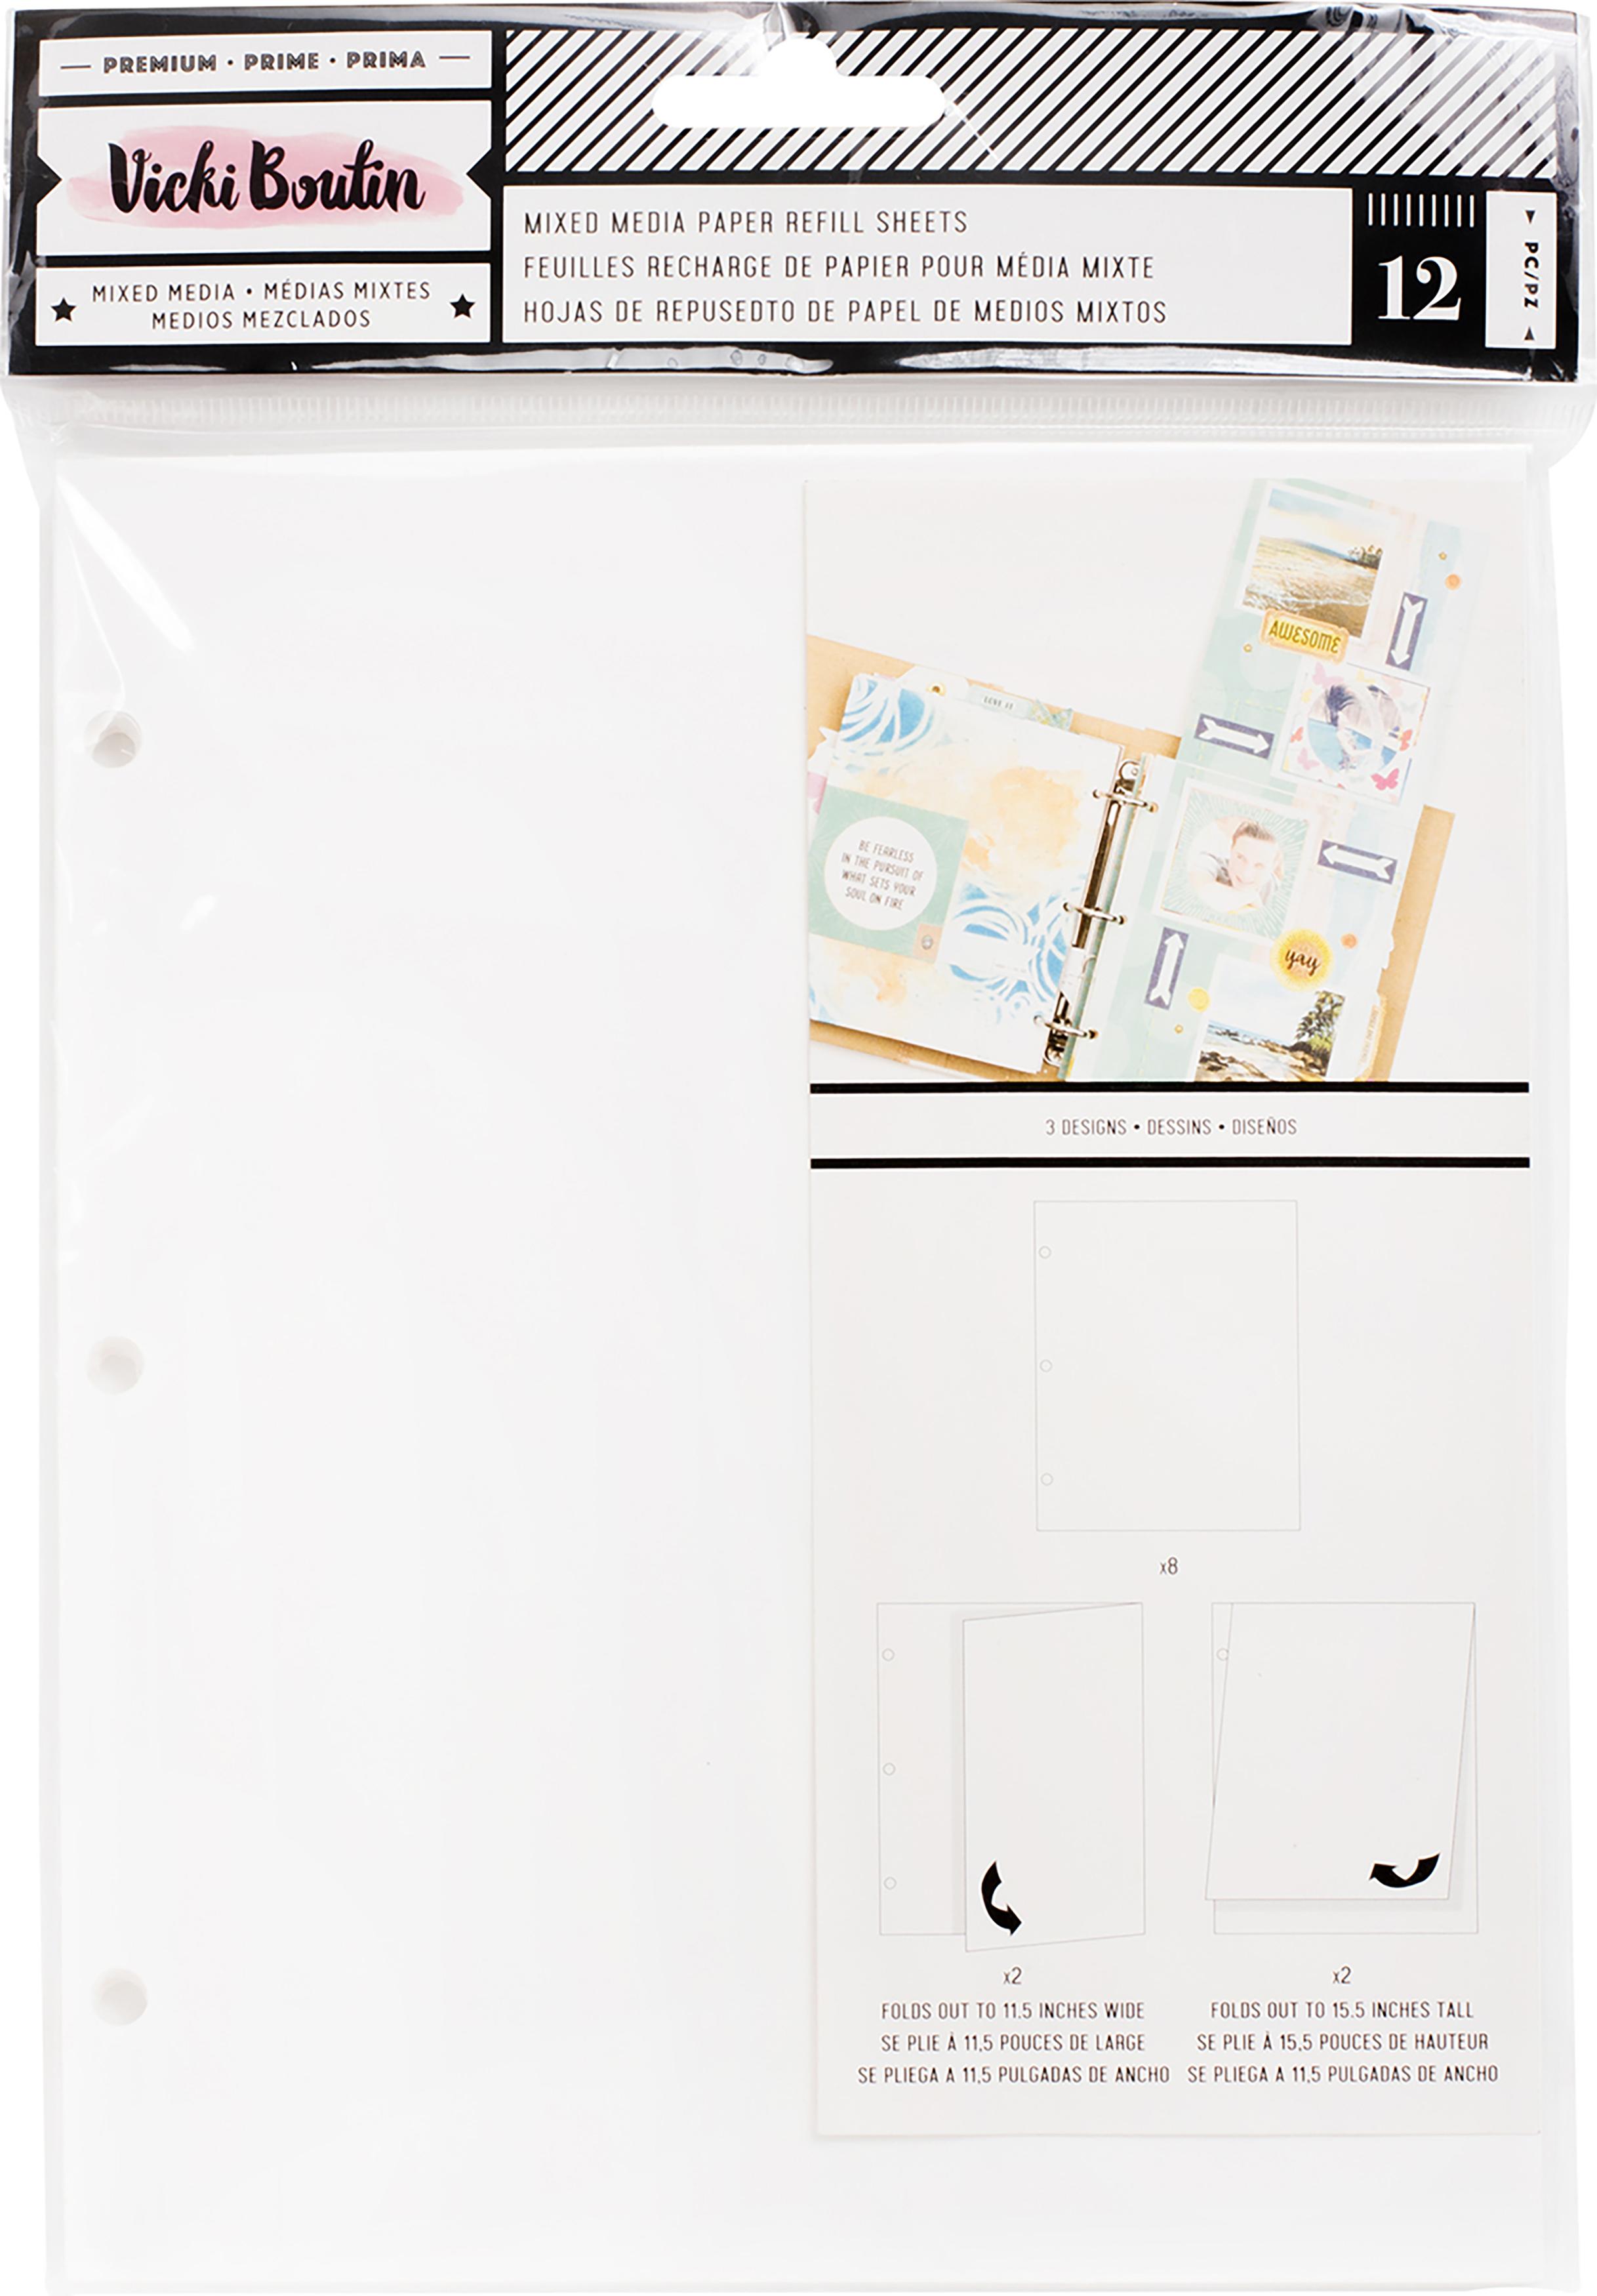 Vicki Boutin Mixed Media Junque Journal Refills 12/Pkg-White Paper, 3 Styles